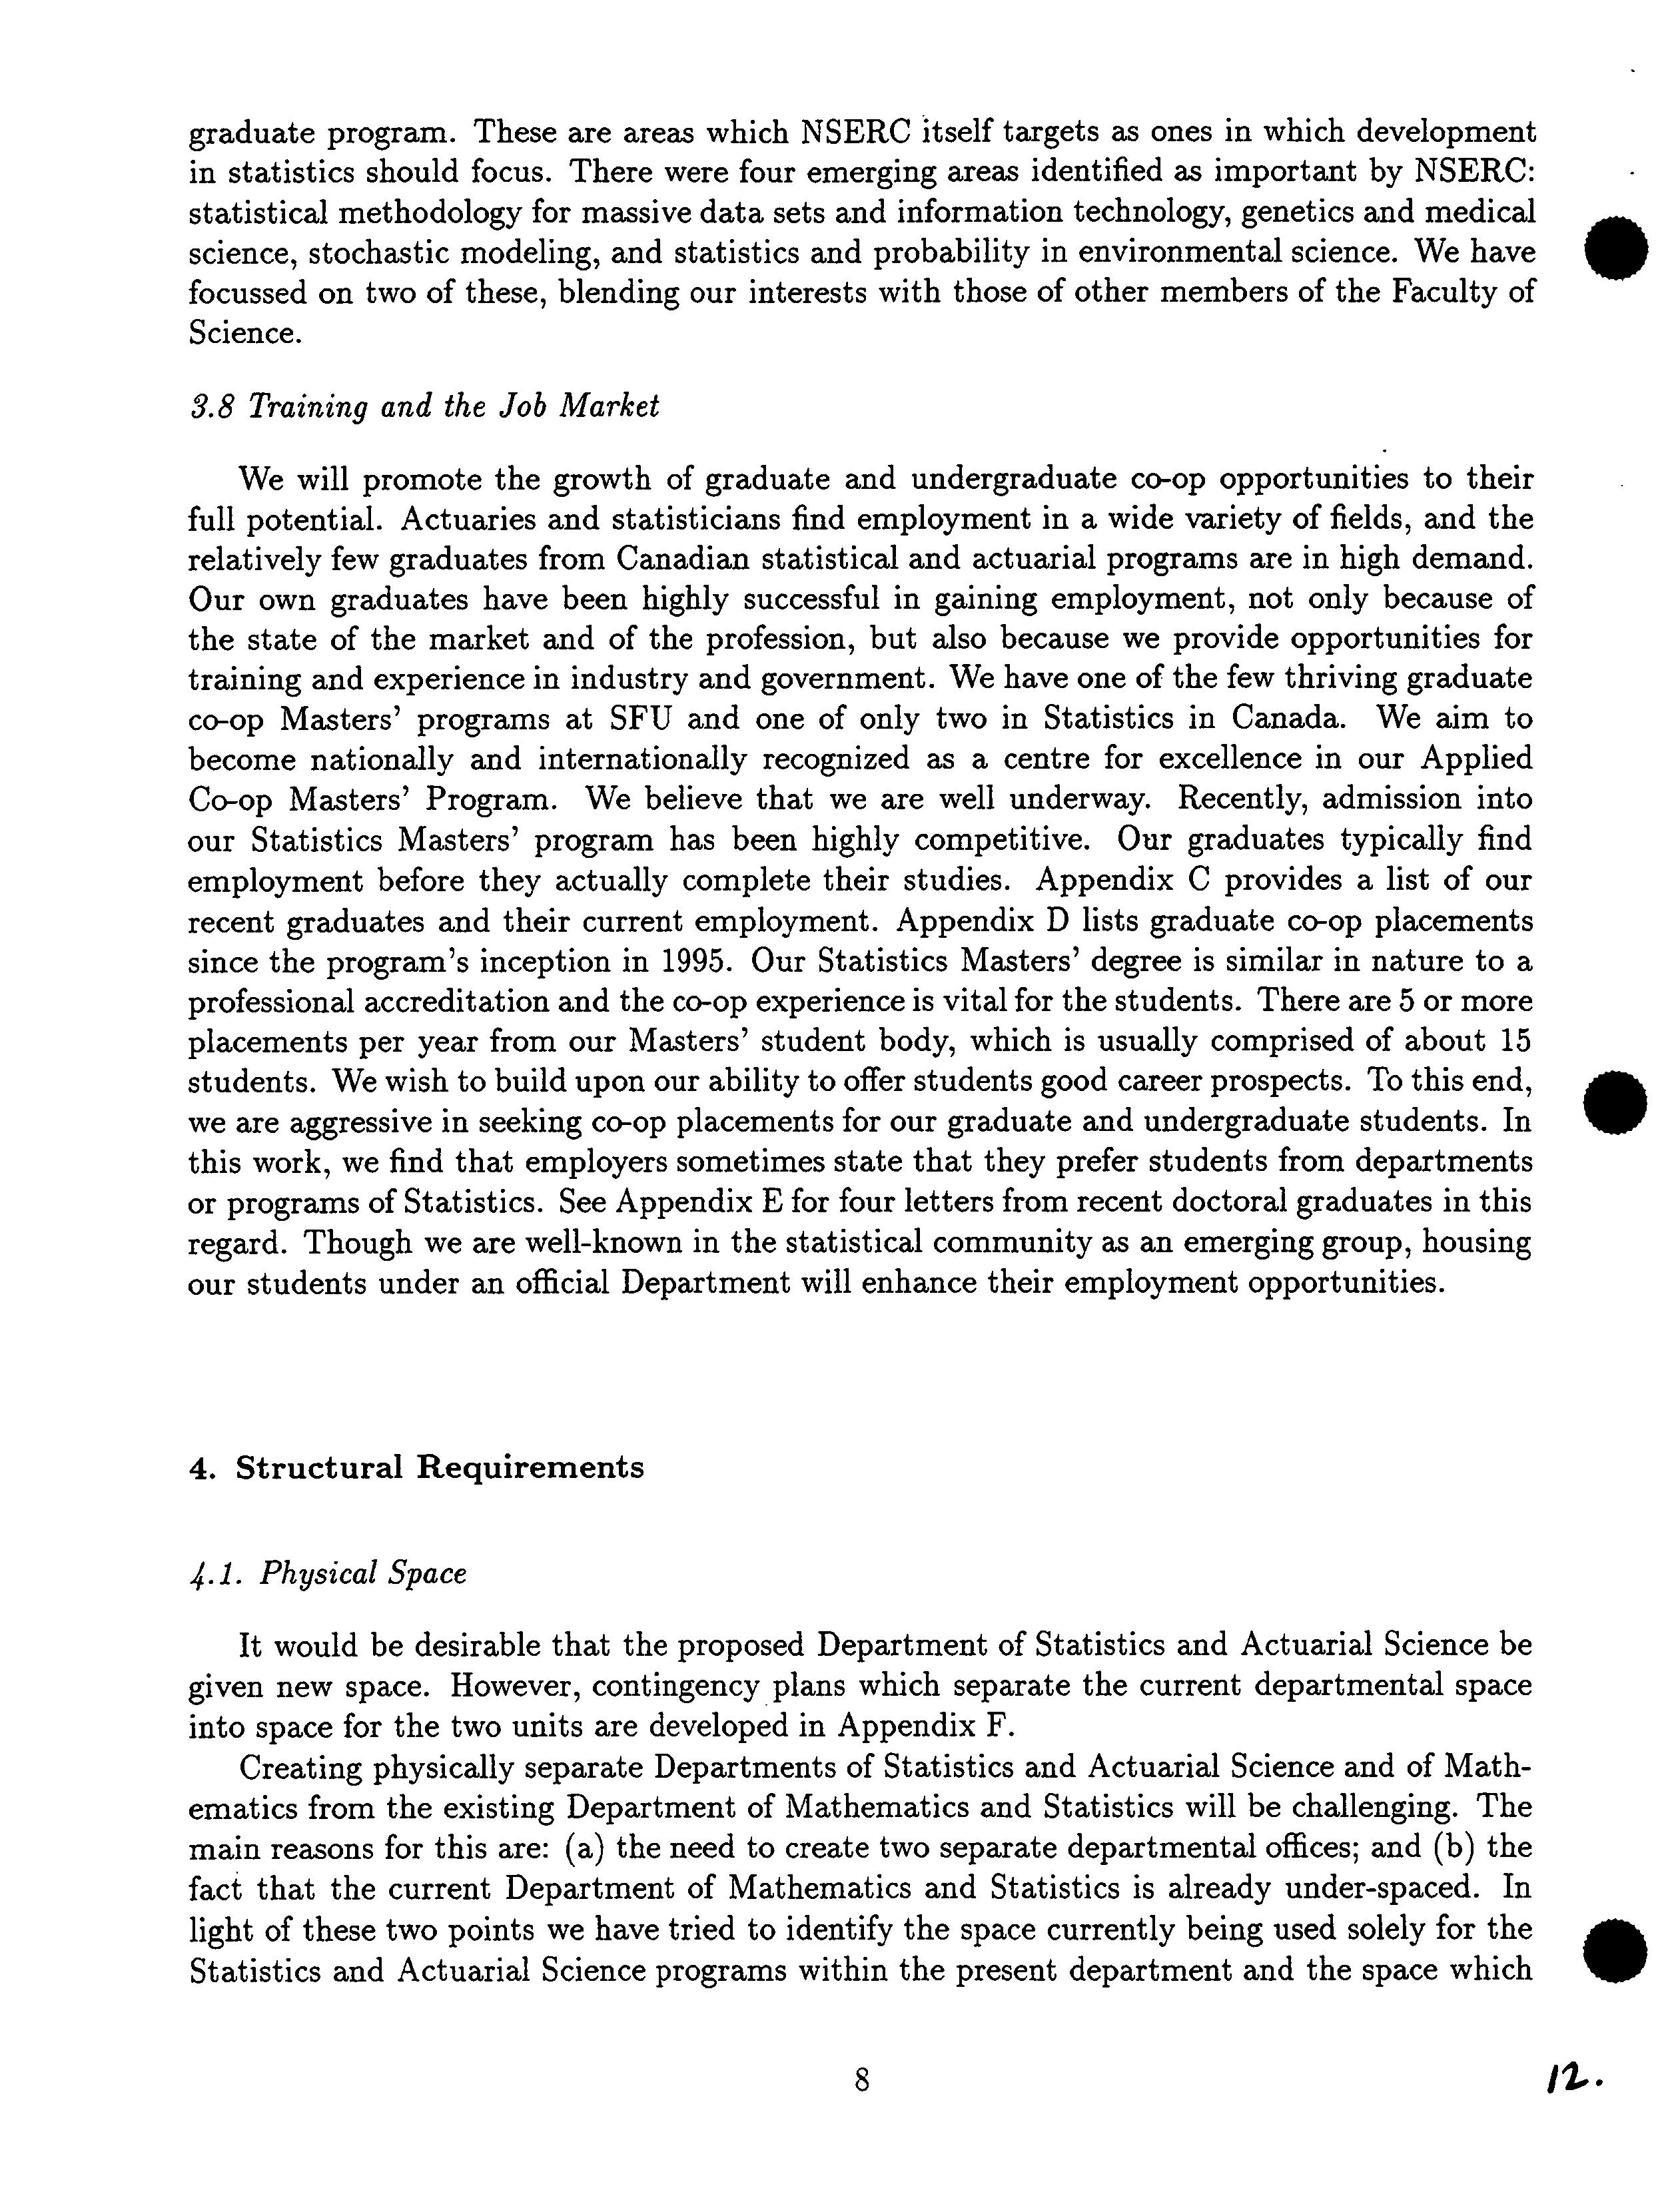 Leadership essays for college visit